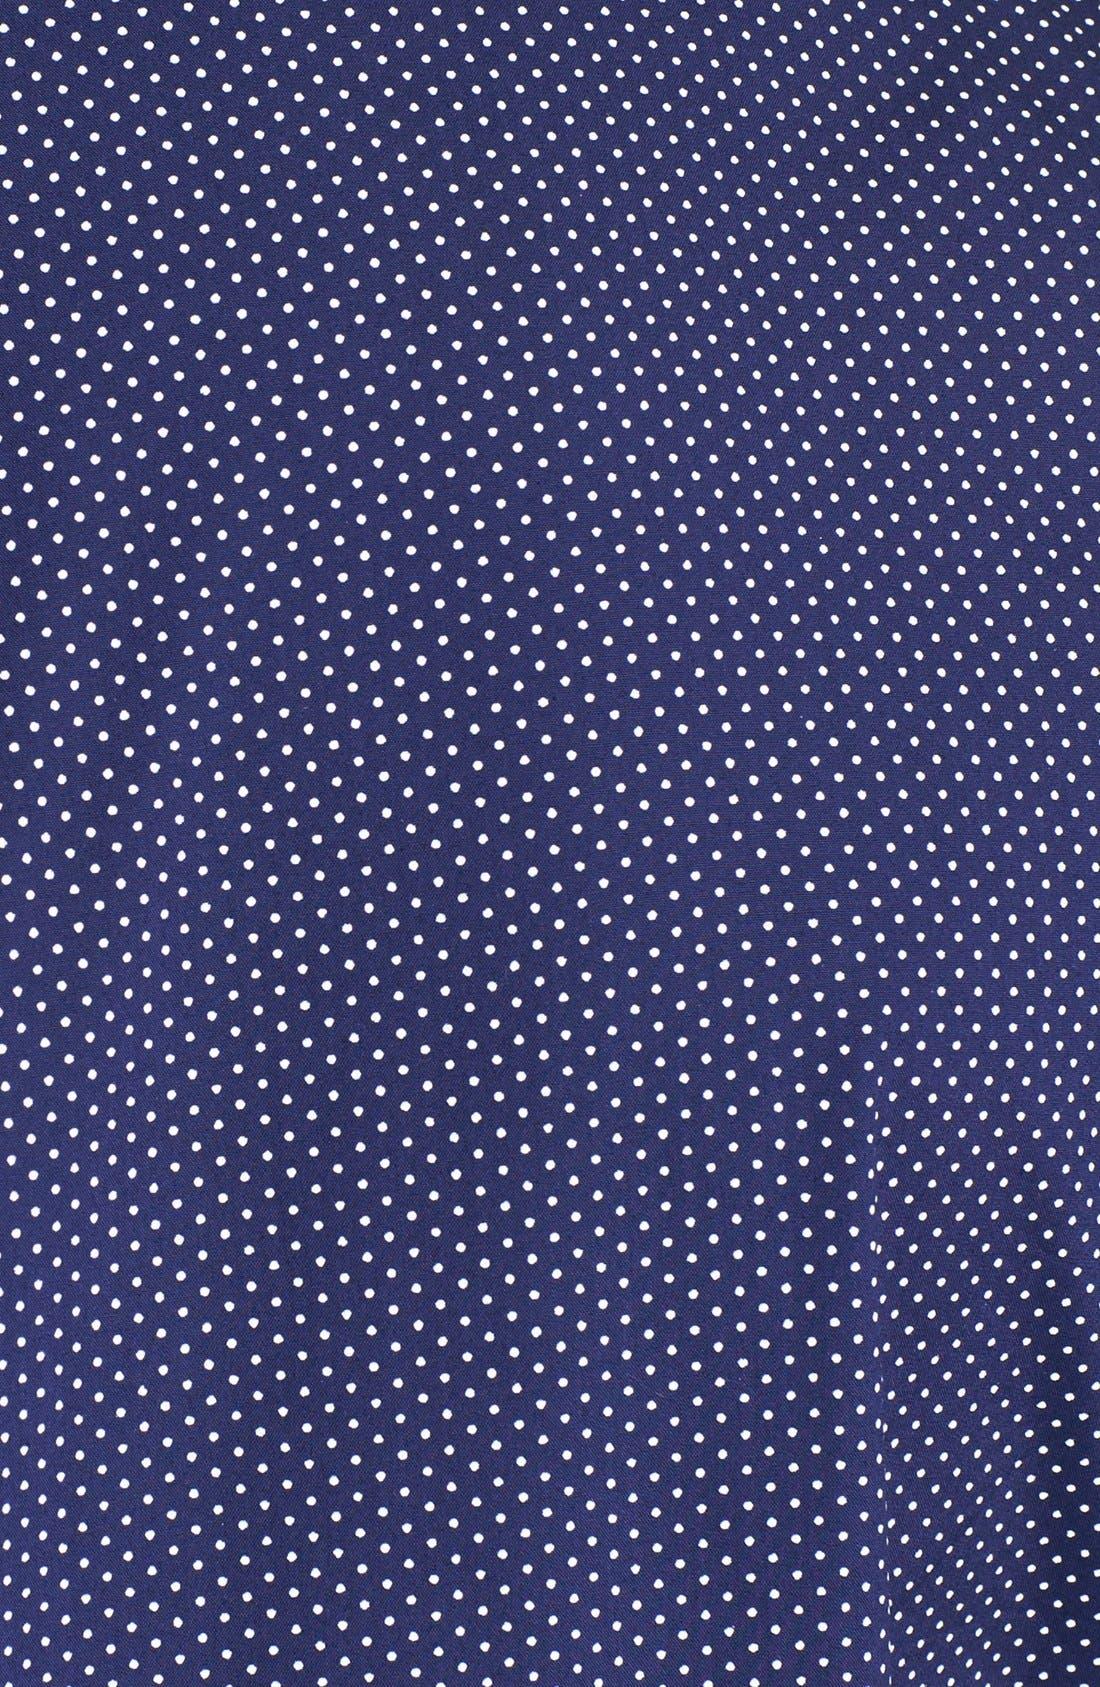 Alternate Image 2  - Descendant of Thieves Dot Woven Shirt